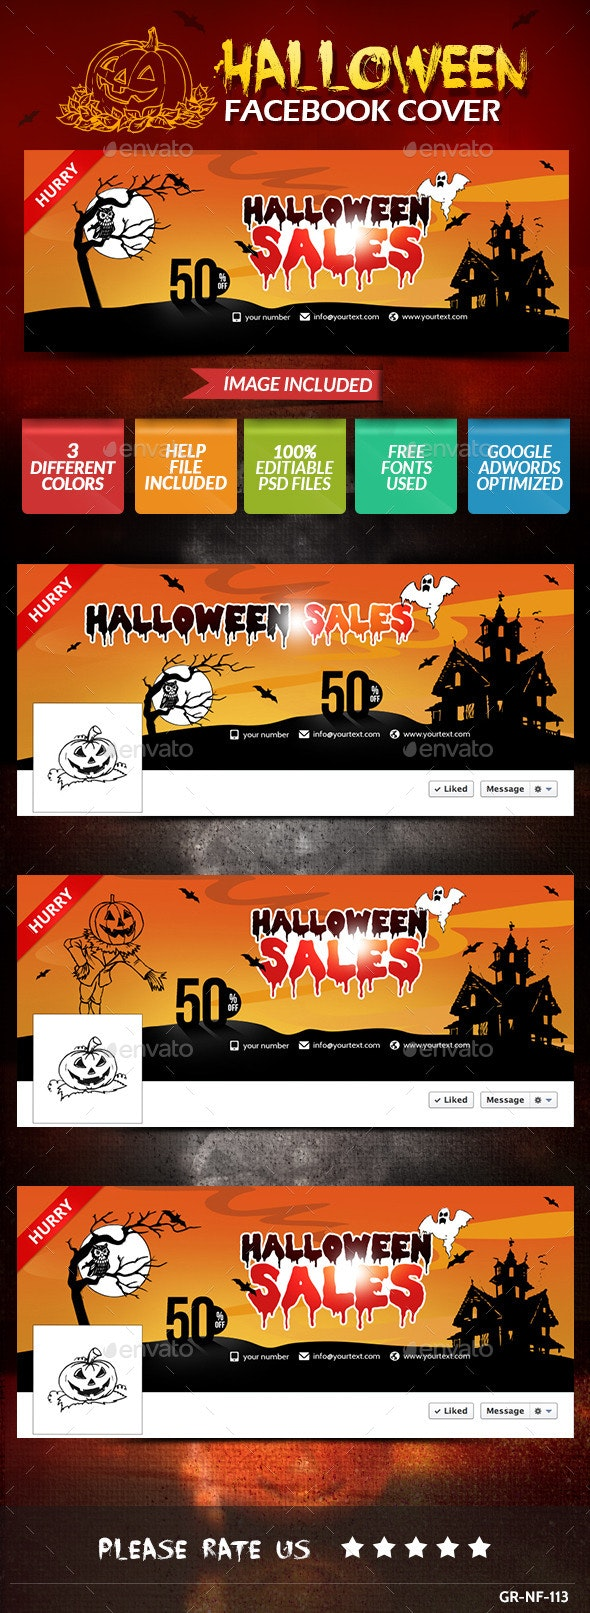 Halloween Facebook Timeline Covers - Facebook Timeline Covers Social Media